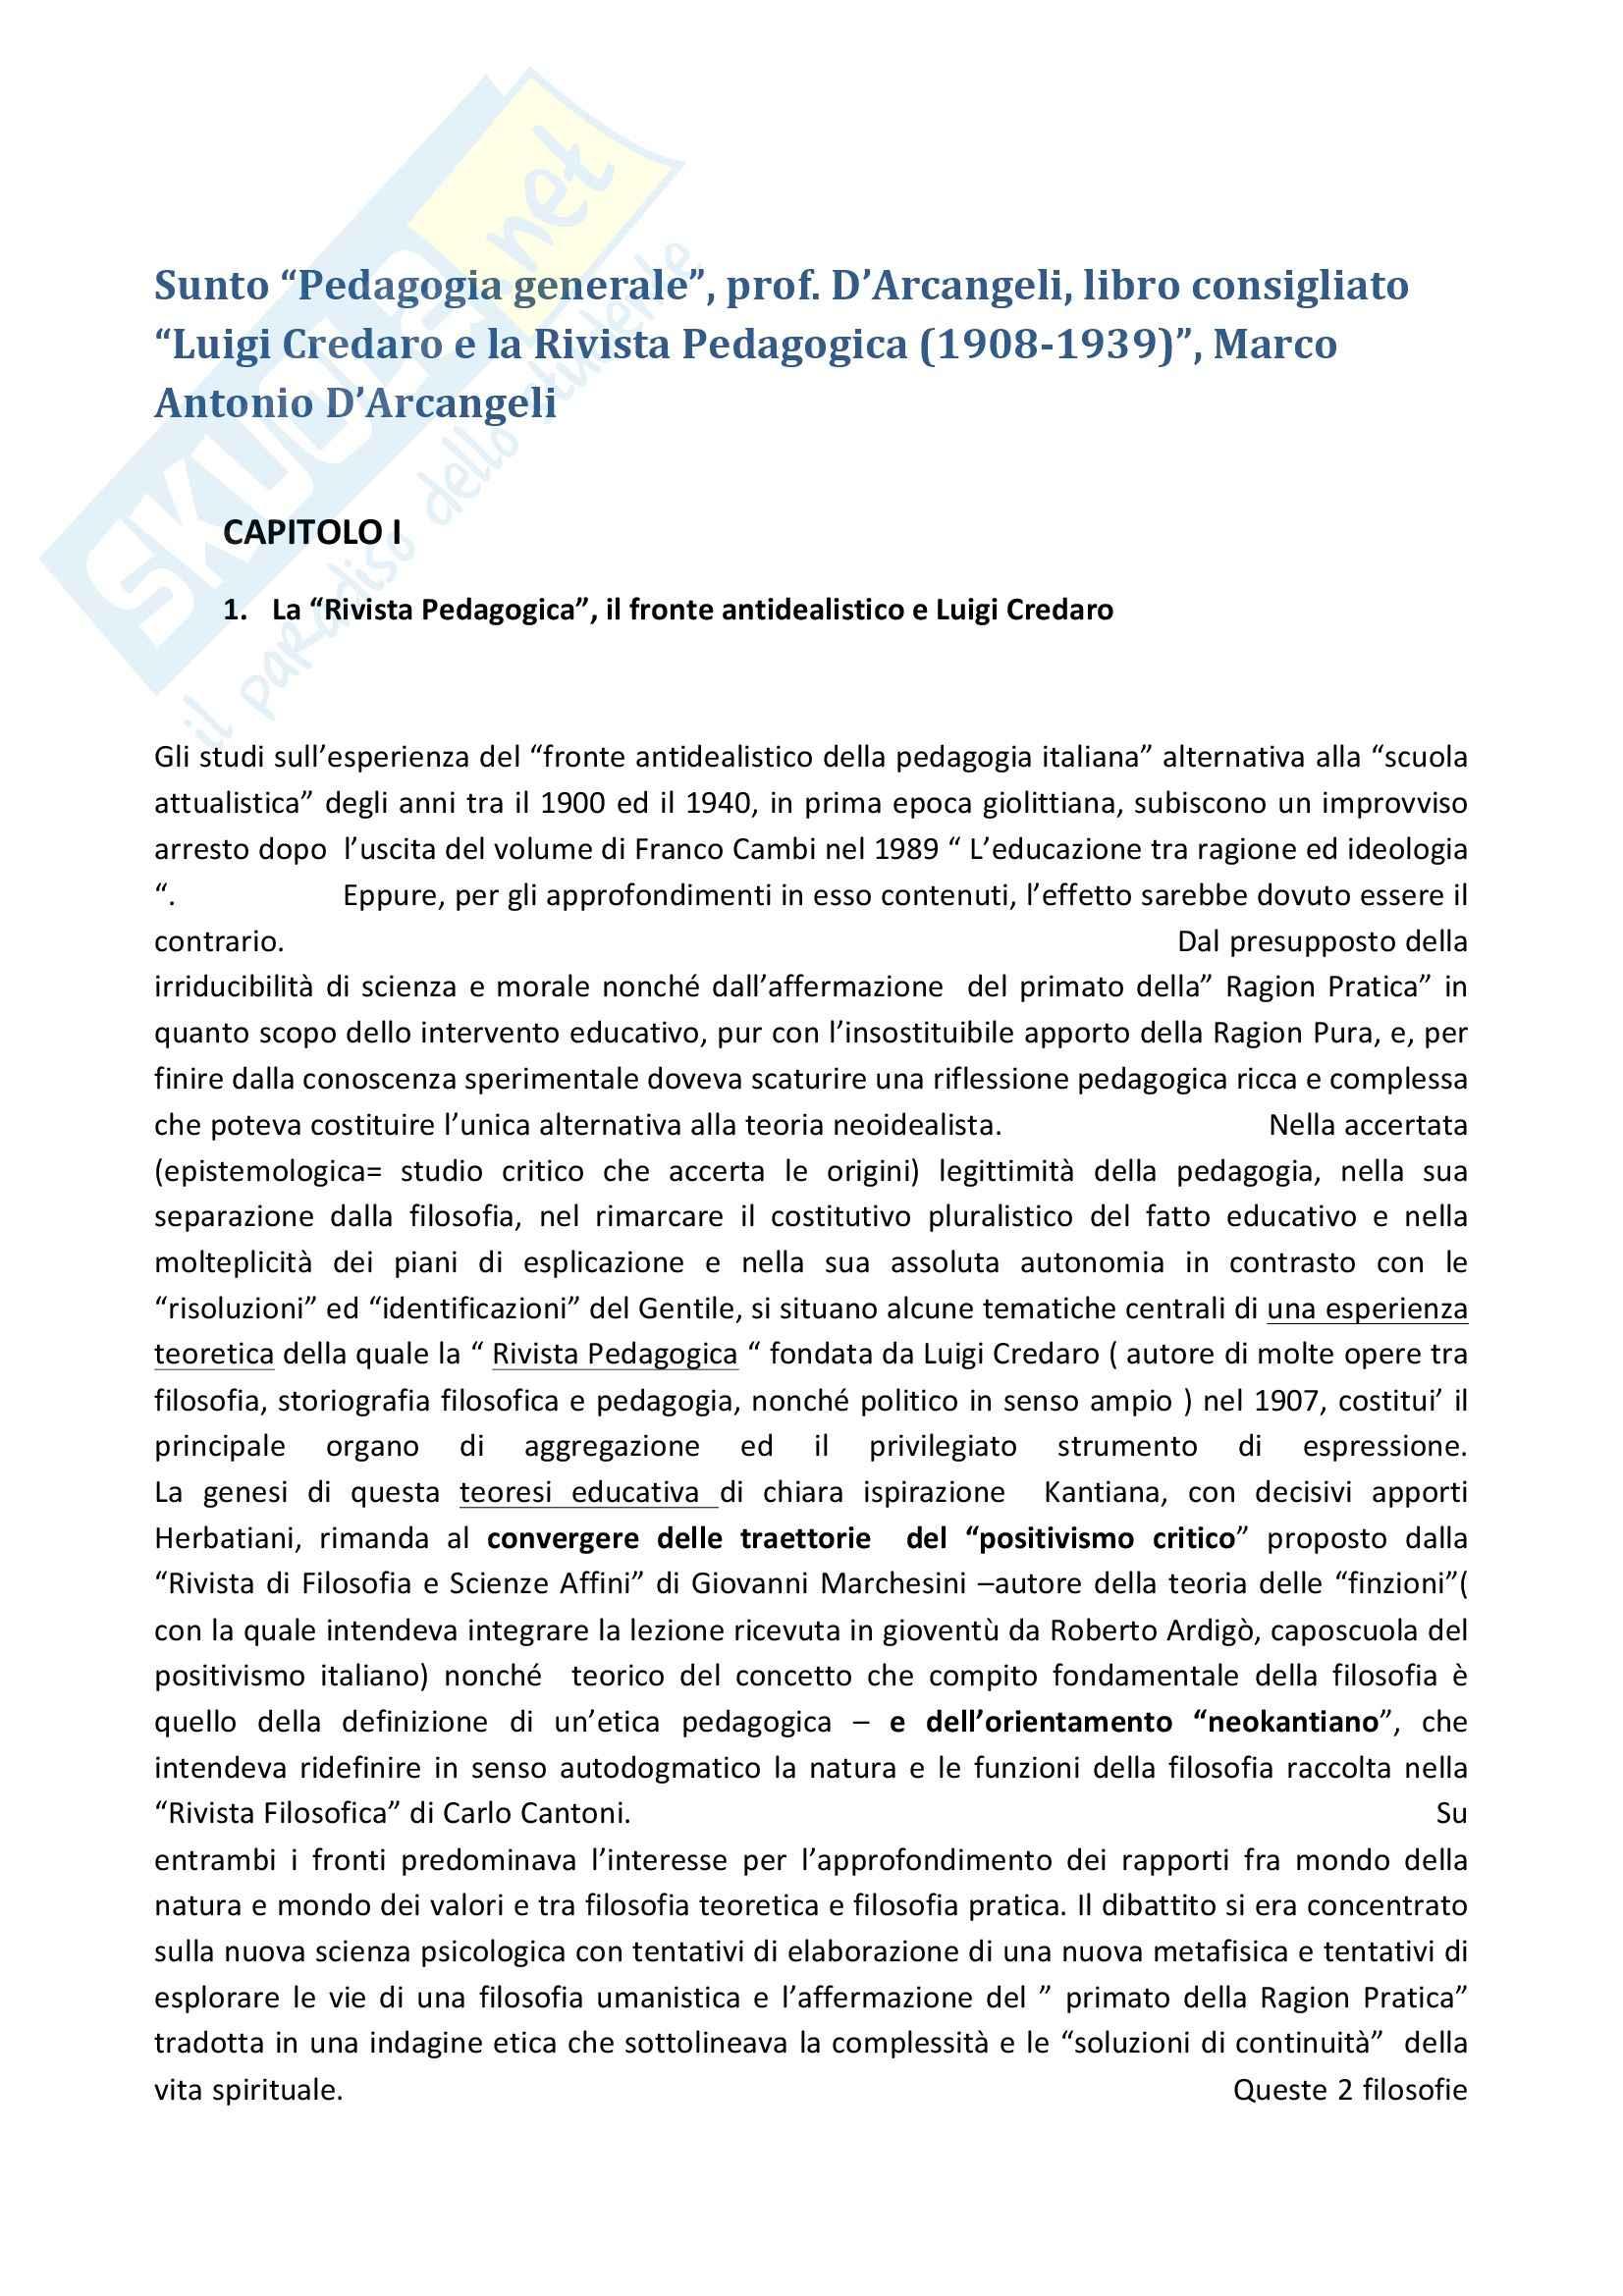 Riassunto esame Pedagogia generale, prof. D'Arcangeli, libro consigliato Luigi Credaro e la Rivista Pedagogica (1908-1939), D'Arcangeli